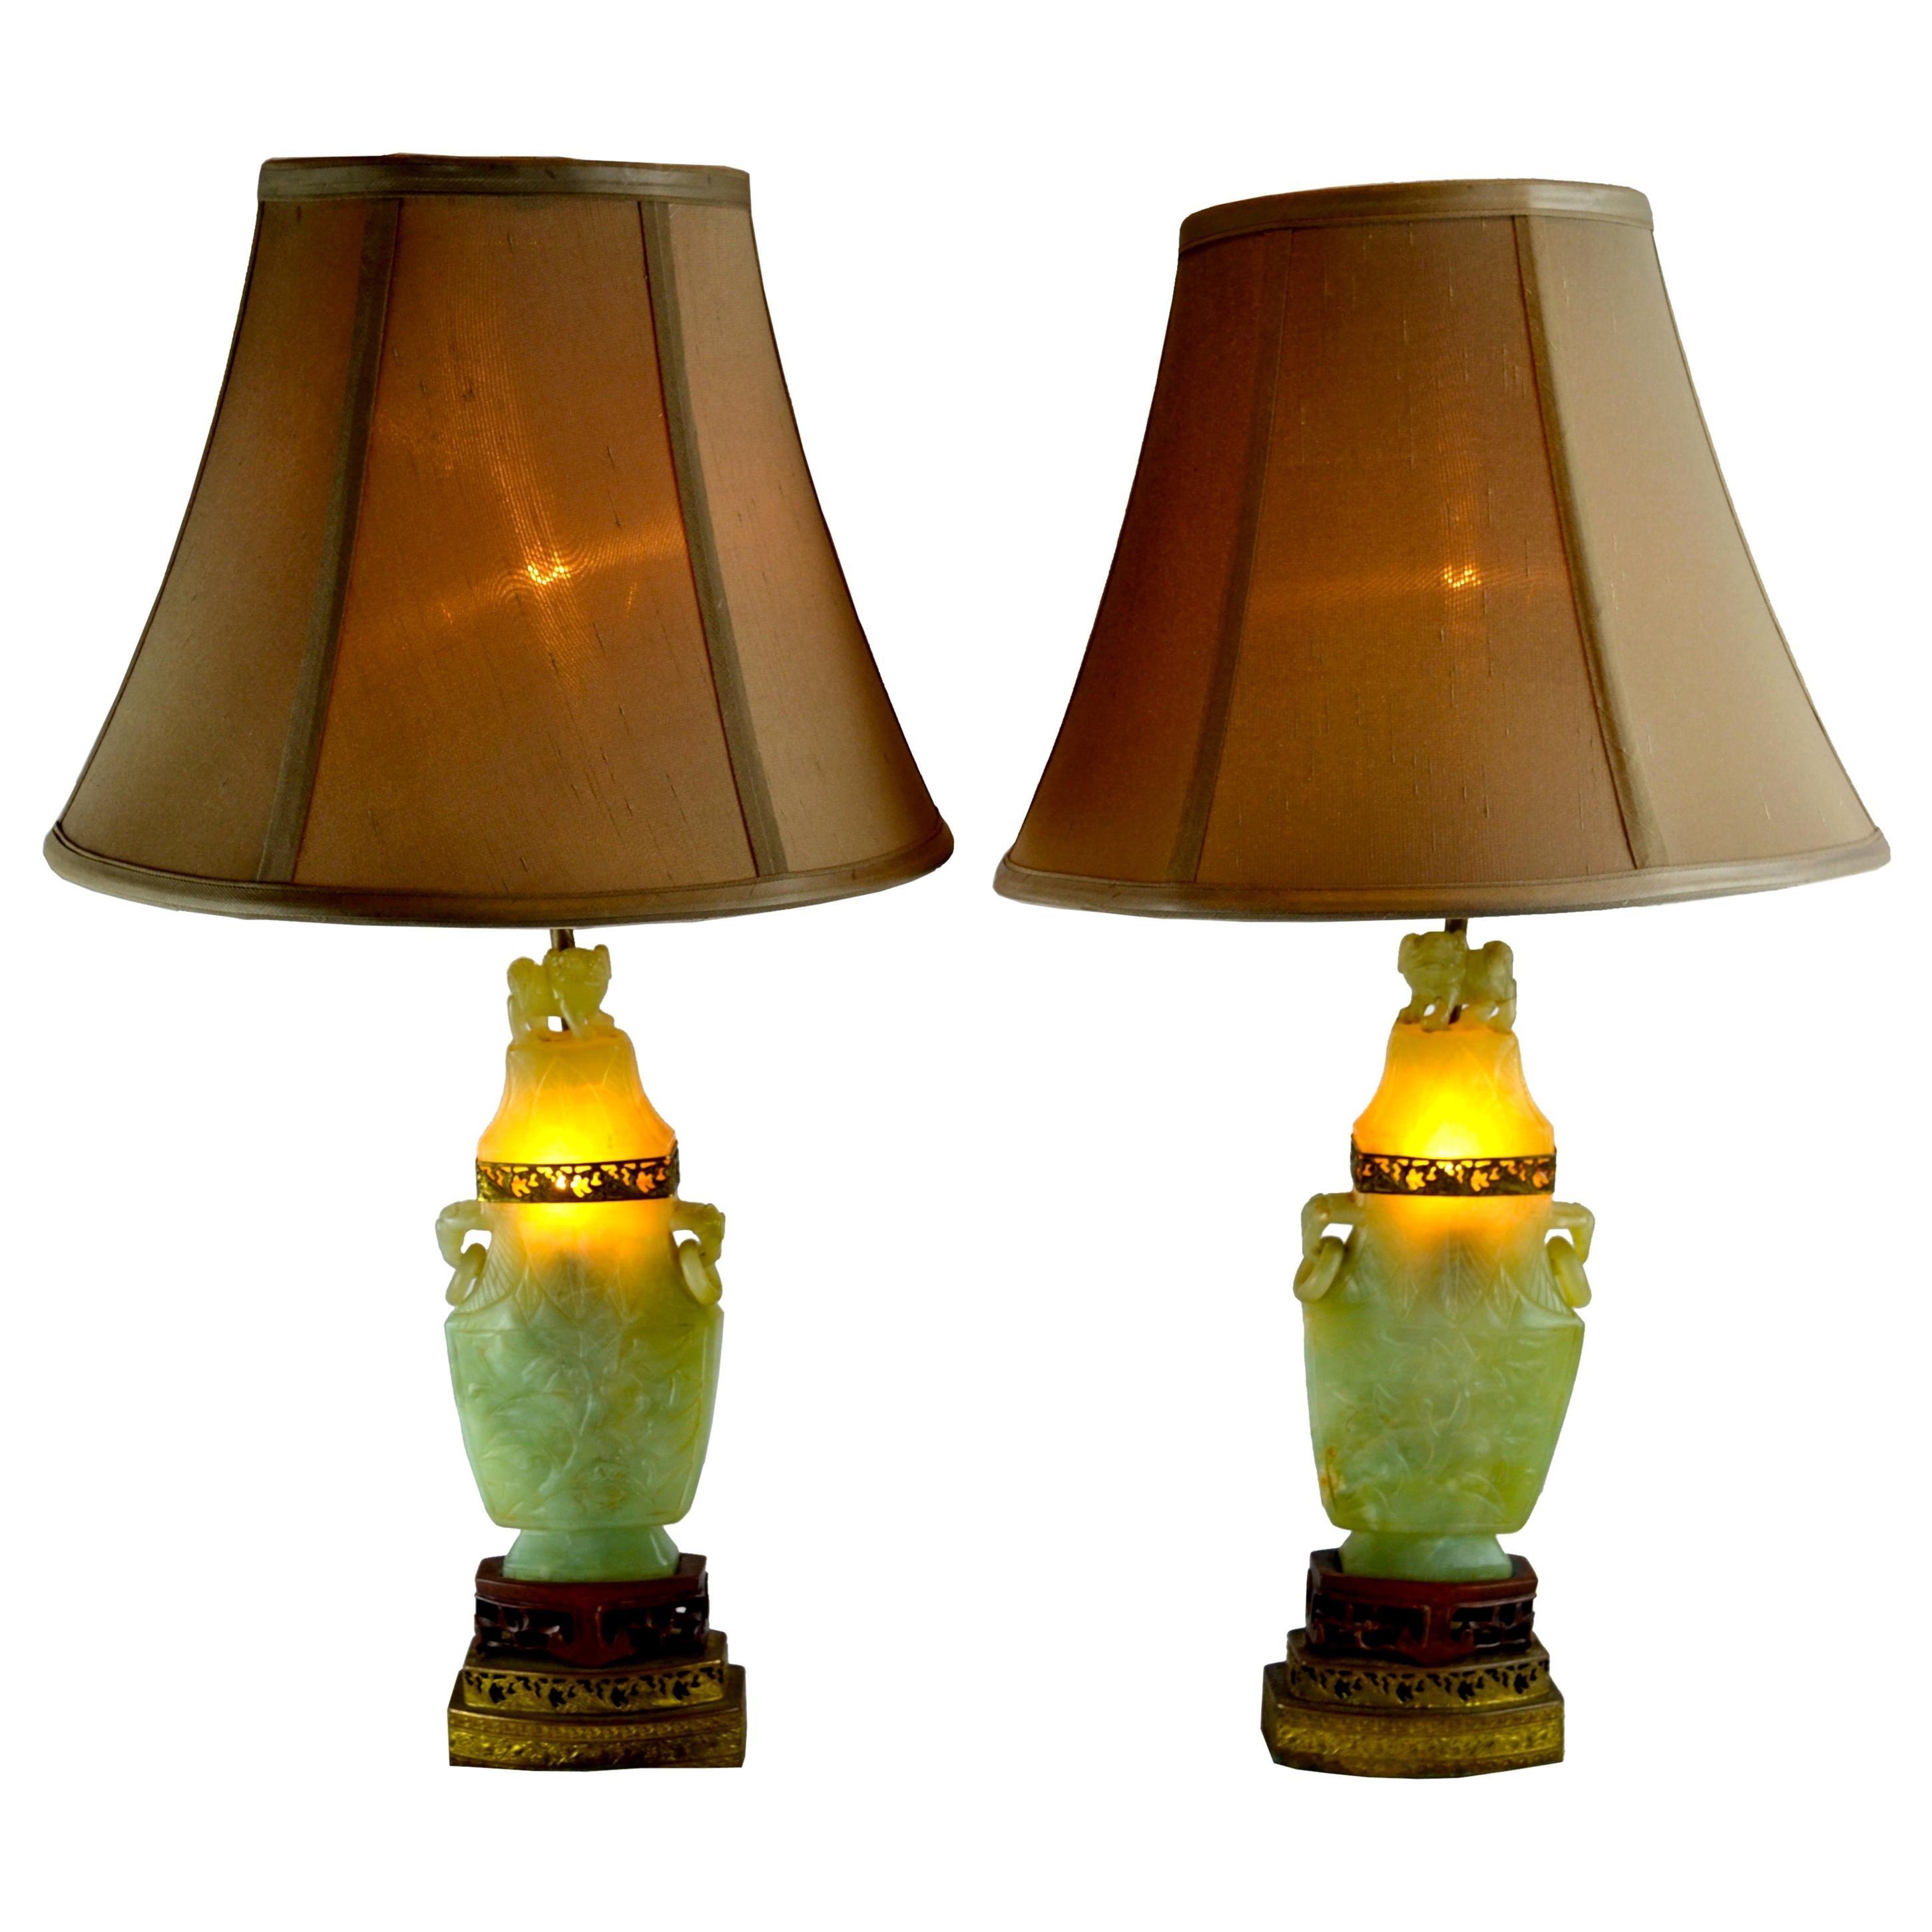 Pair of Chinese Export Jadeite Stone Lamps